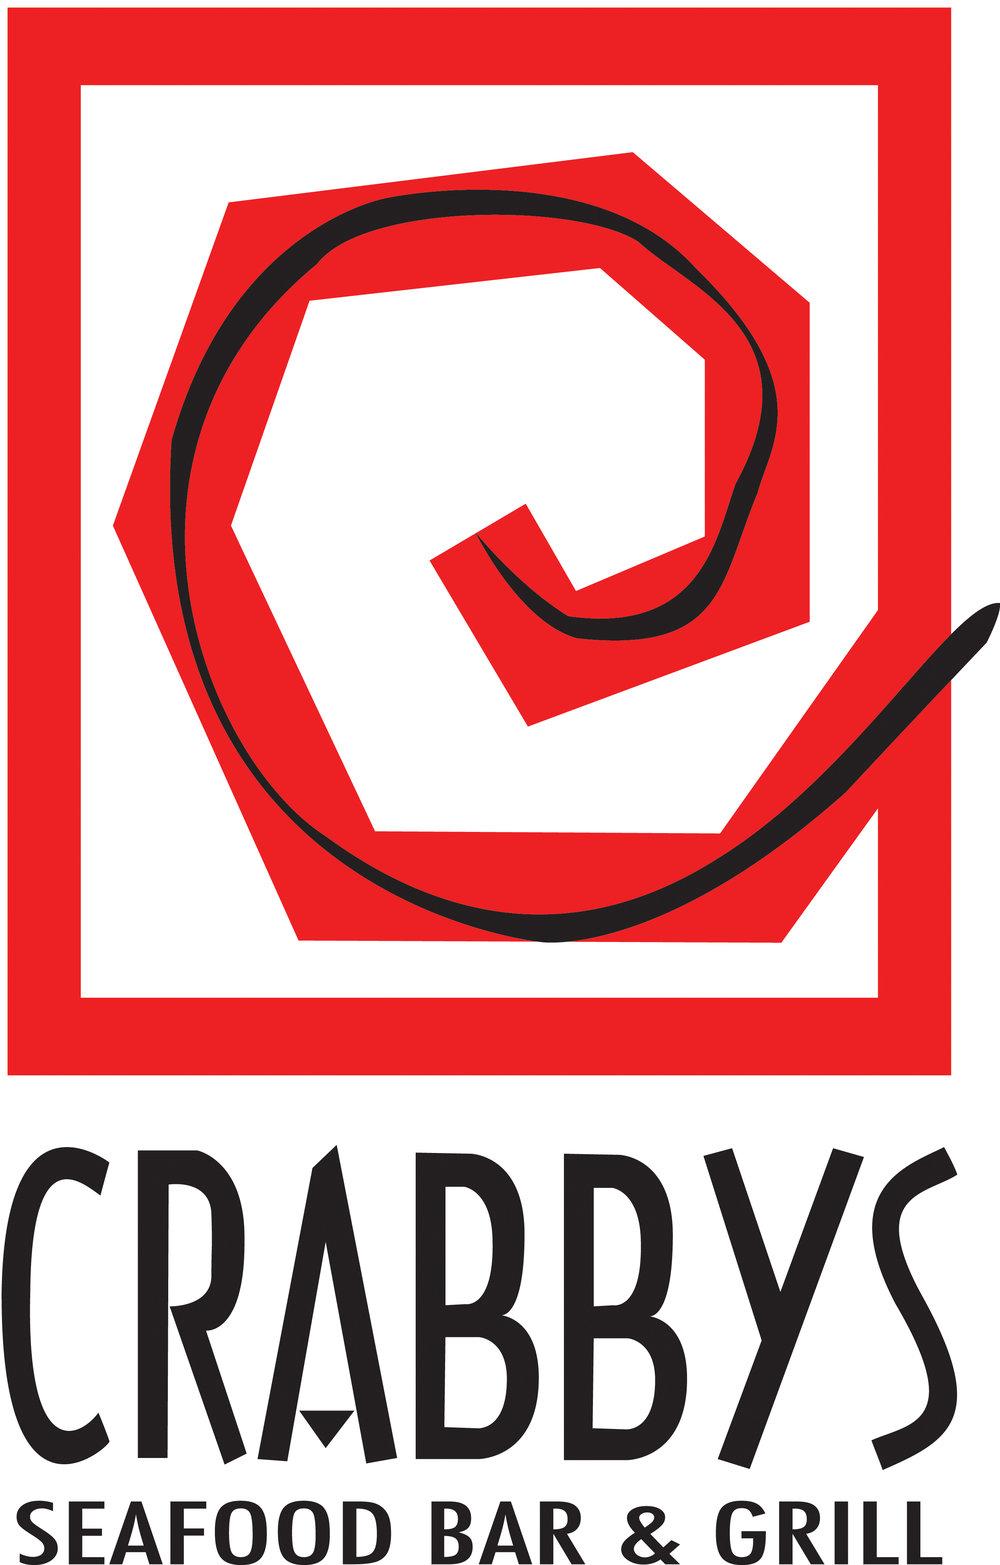 Crabbys Seafood Bar & Grill